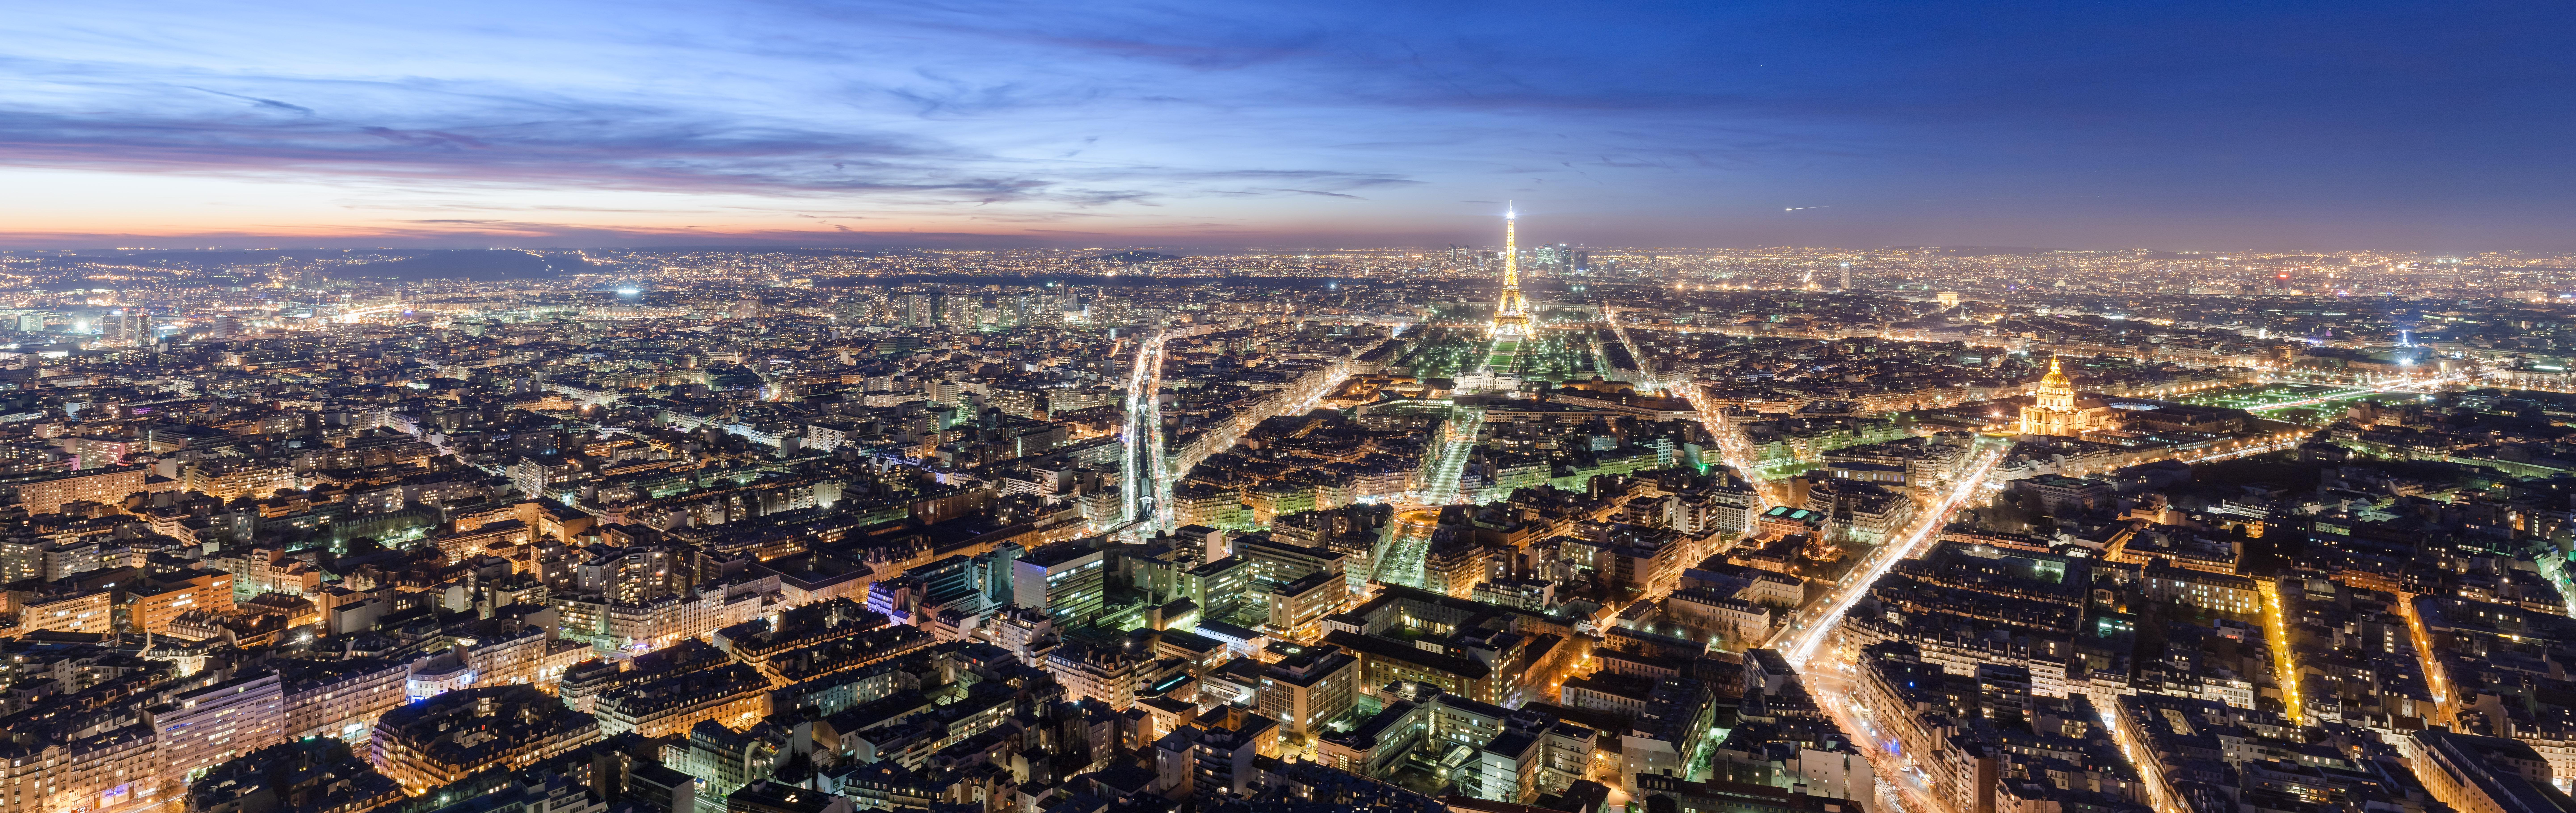 Paris at nigh